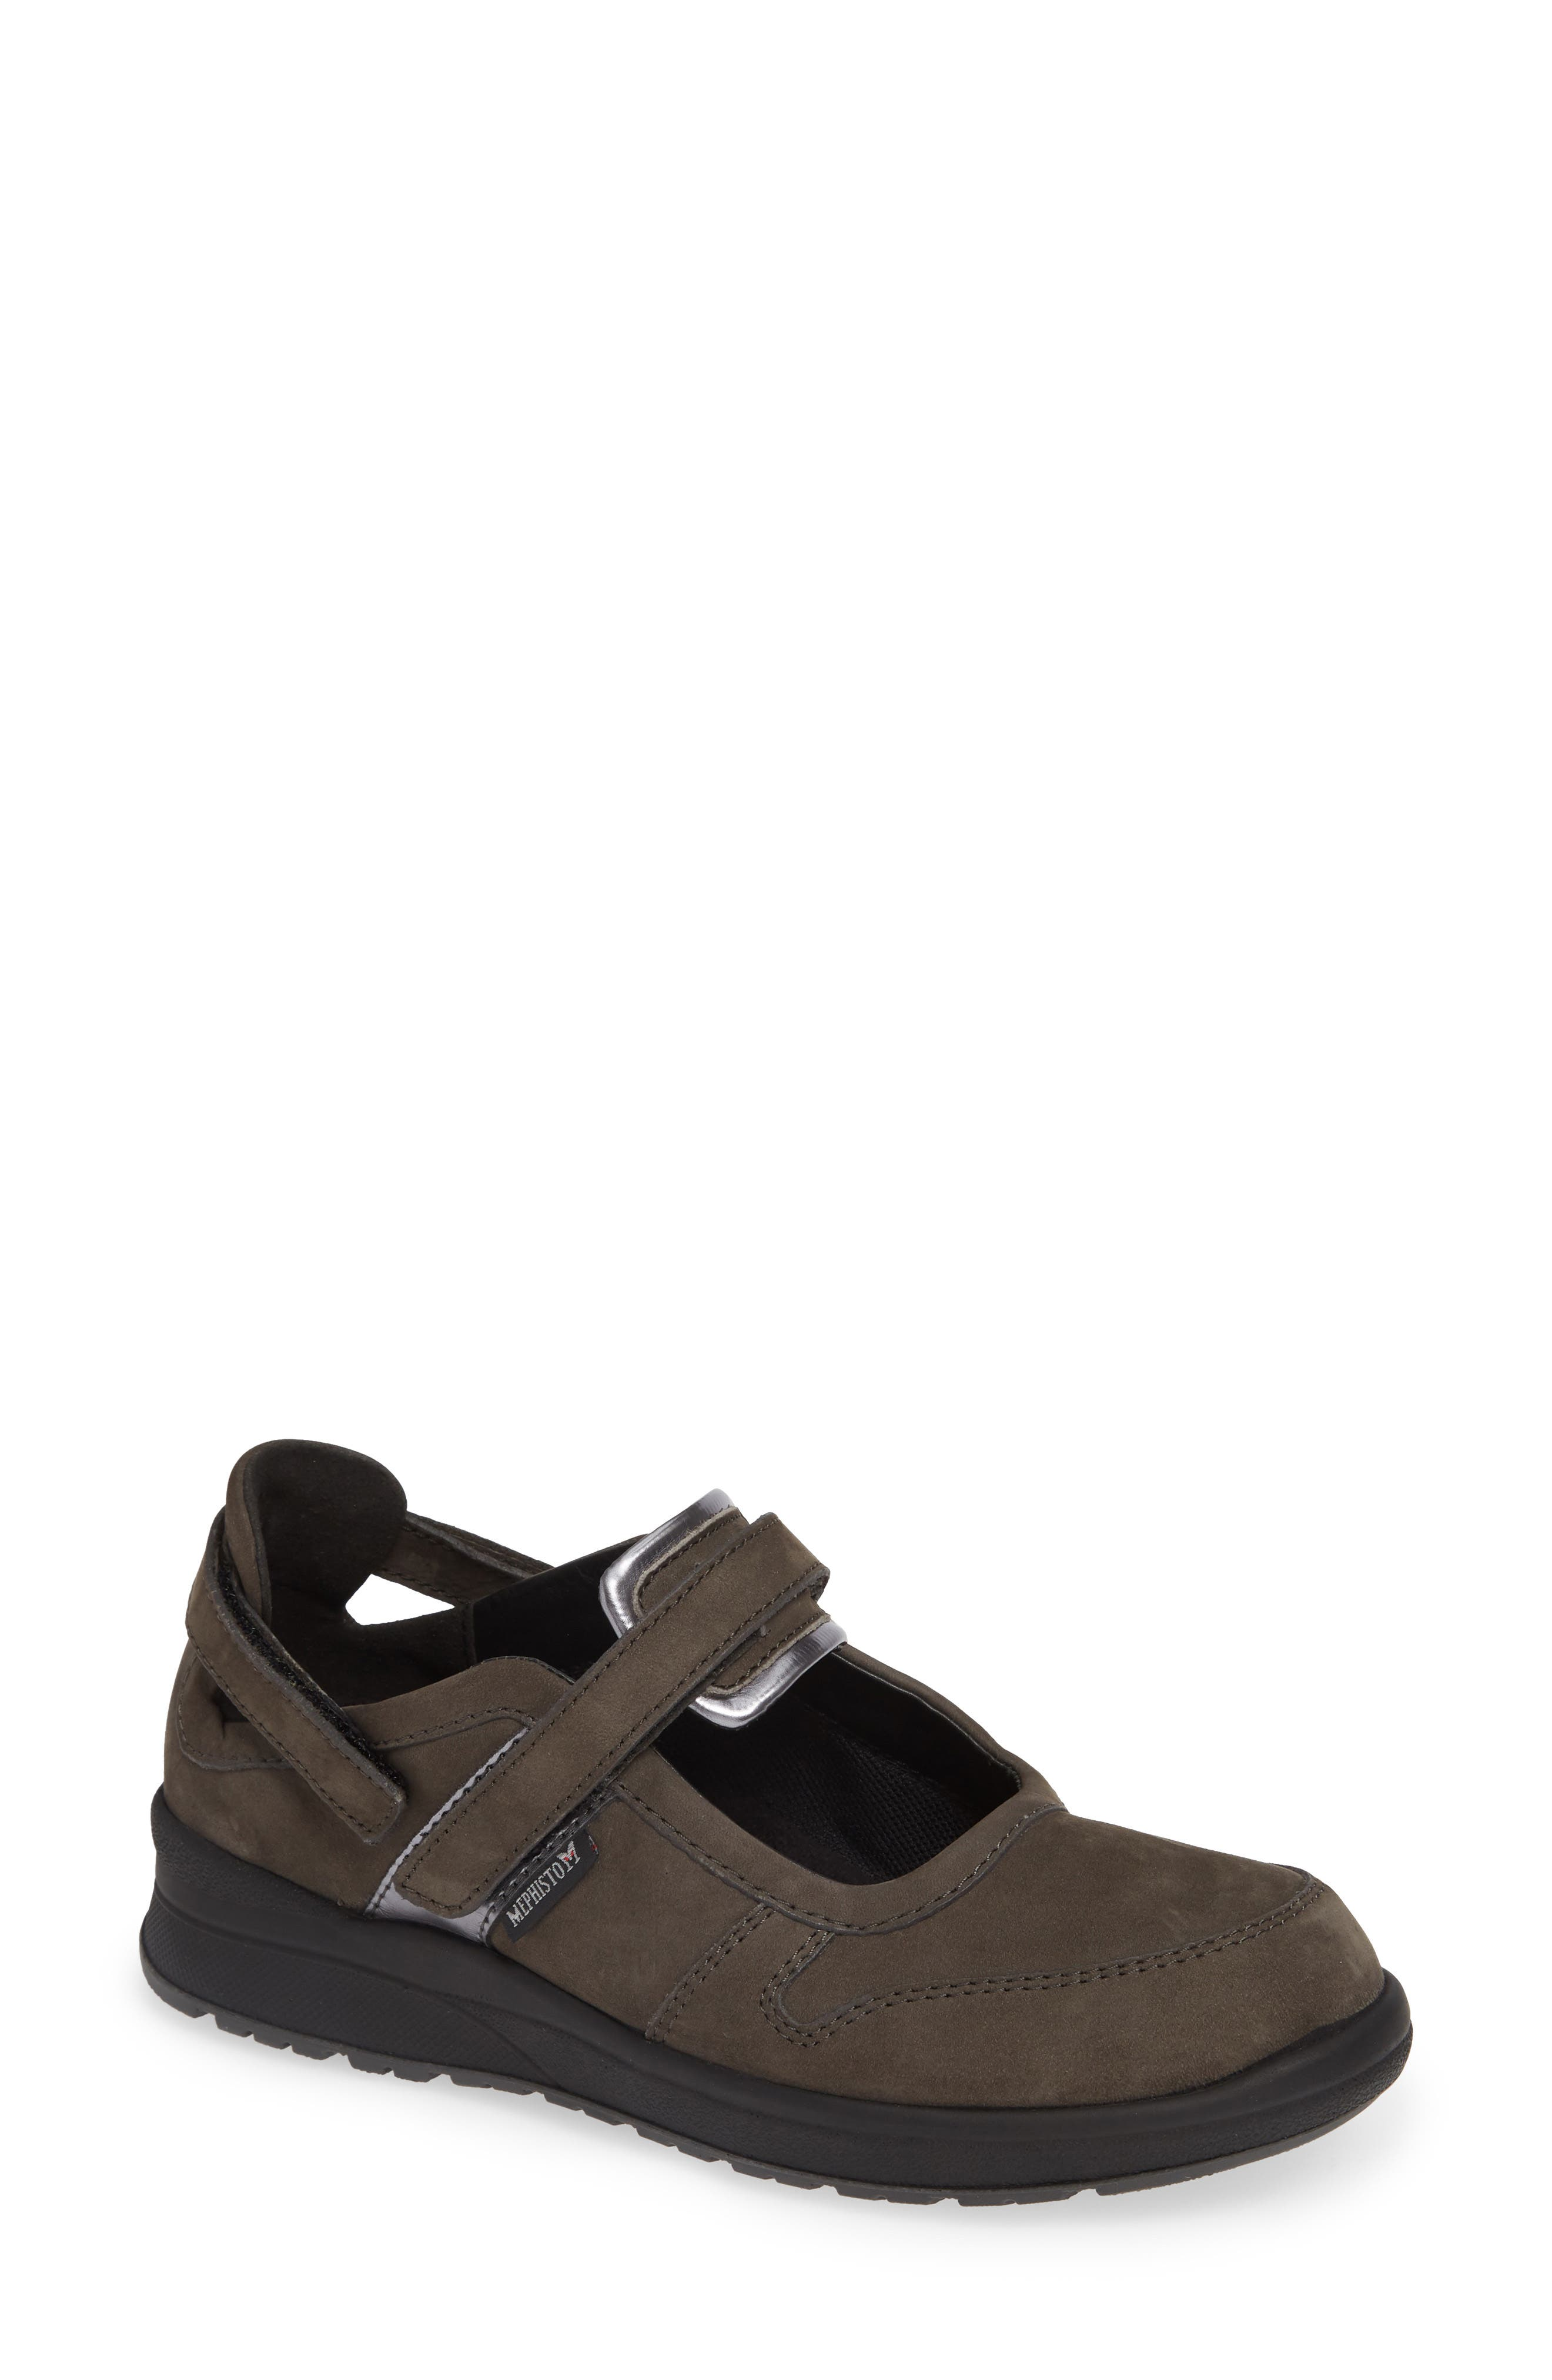 Mephisto Rejine Sneaker- Grey